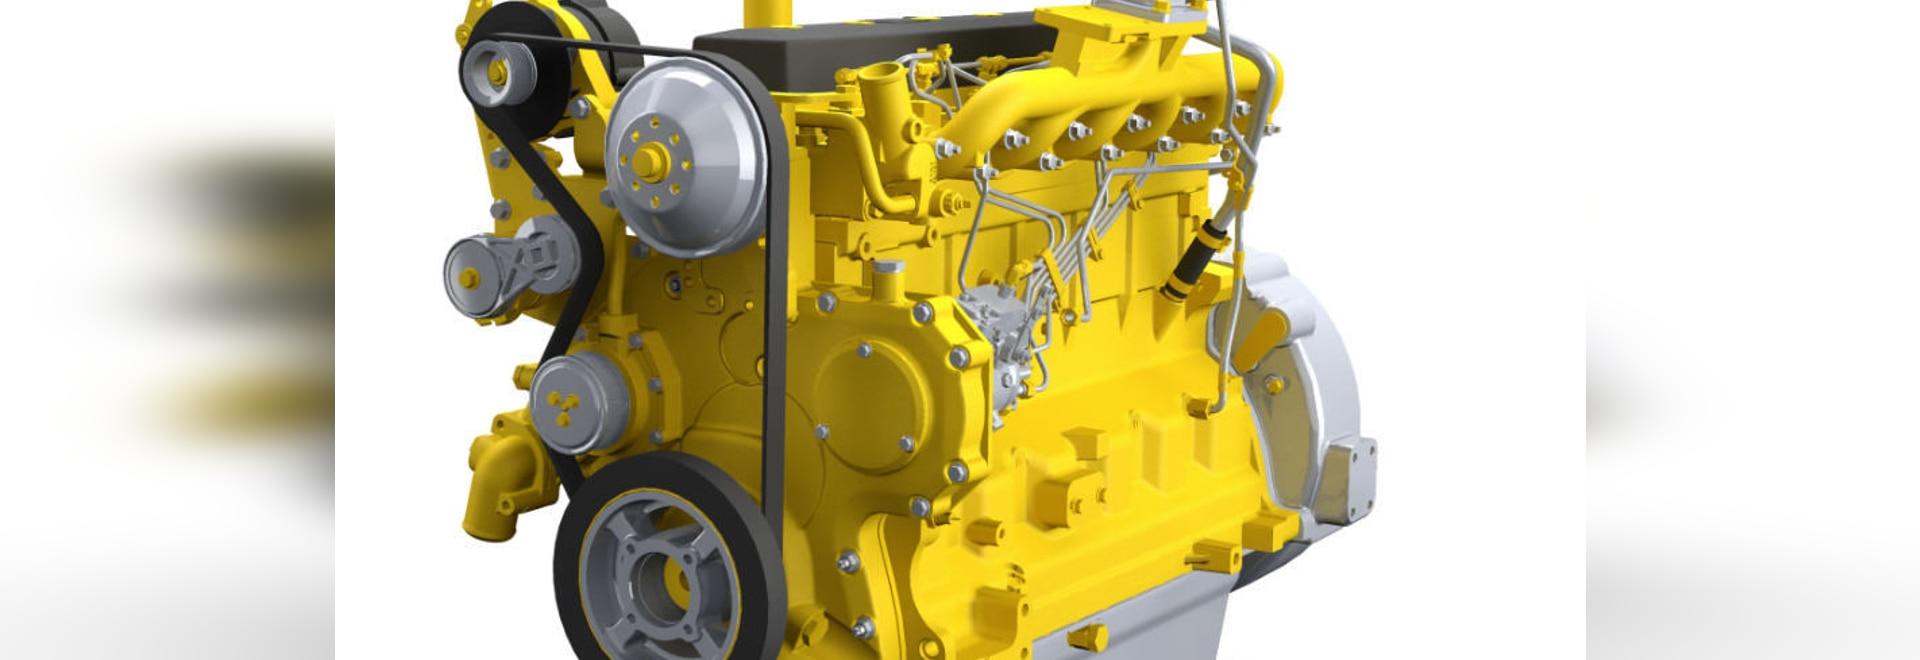 John Deere extends generator drive range